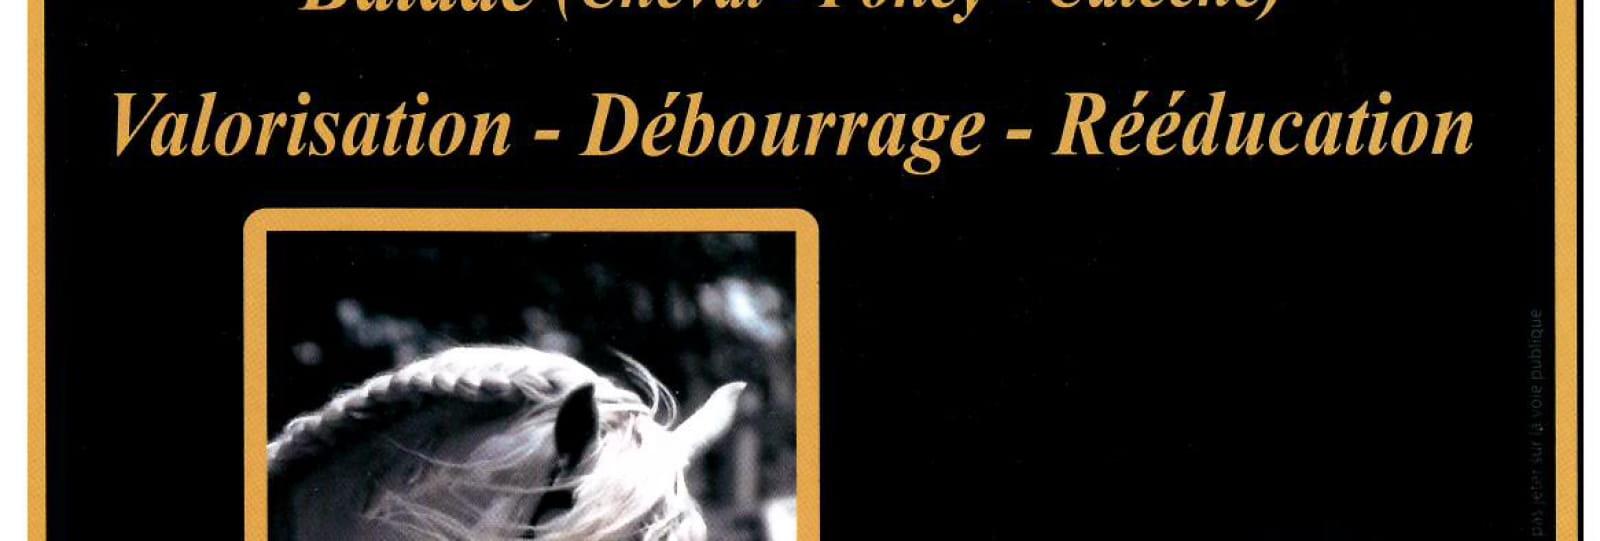 Elevage Peyron-Centre Equestre